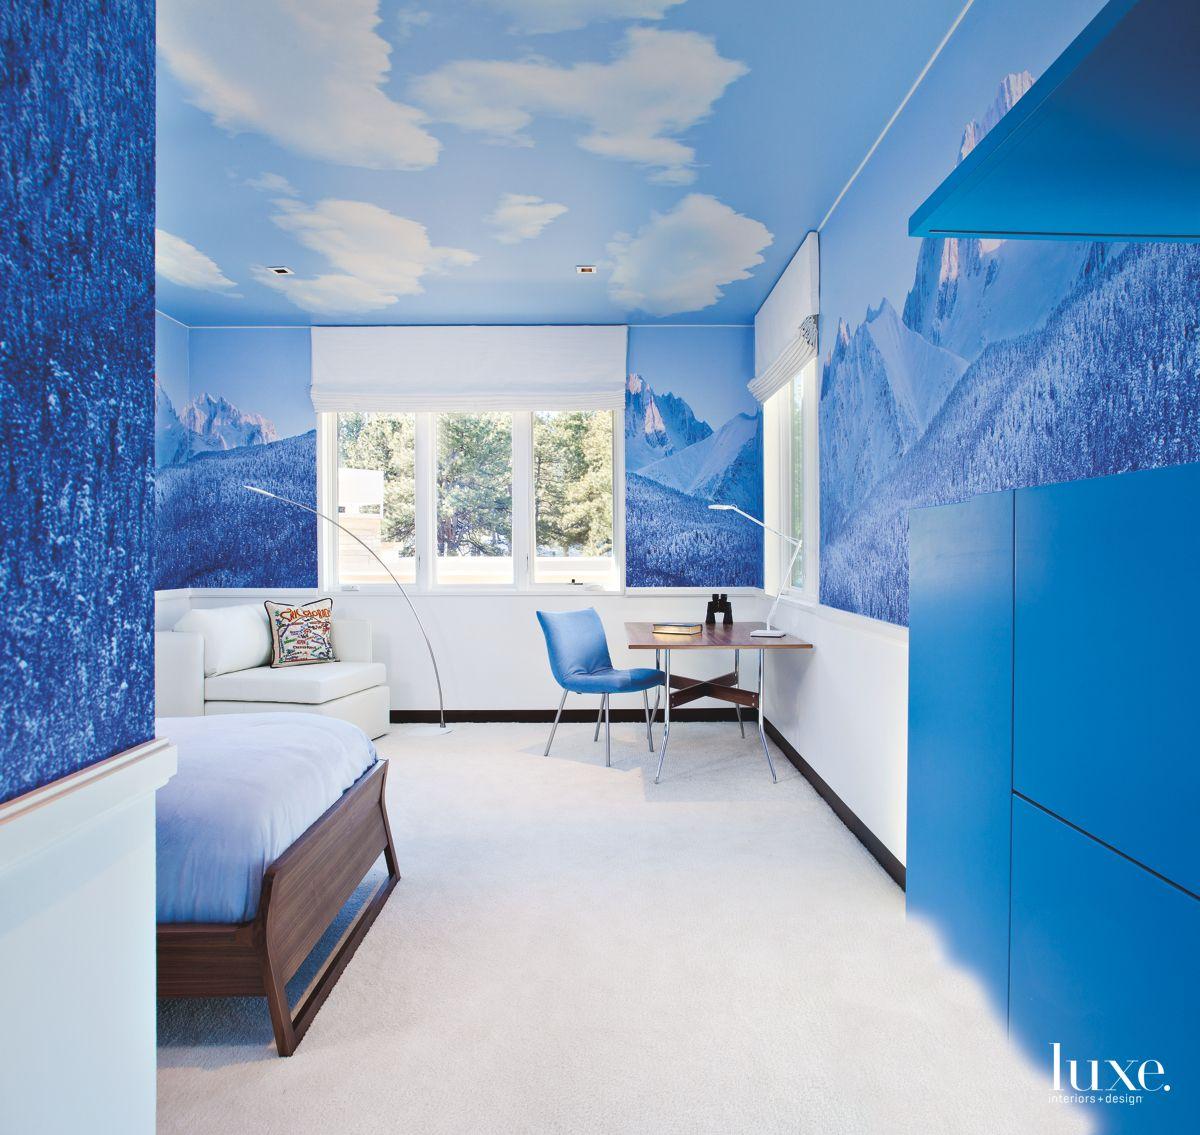 Wall Mural Brings the Mountains Inside of Modernist Denver Home